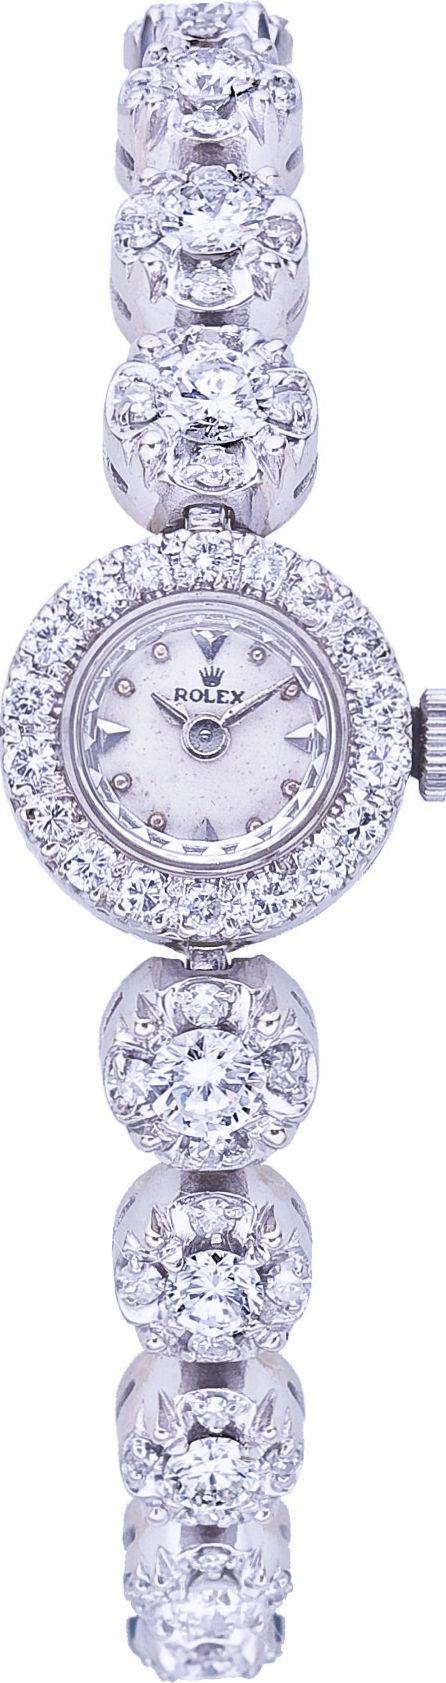 Another Favorite! Woman's Diamond Rolex watch dream. See more from Rolex at Maxon's Diamond Merchants! http://www.rockinghamdisplayshop.co.uk/